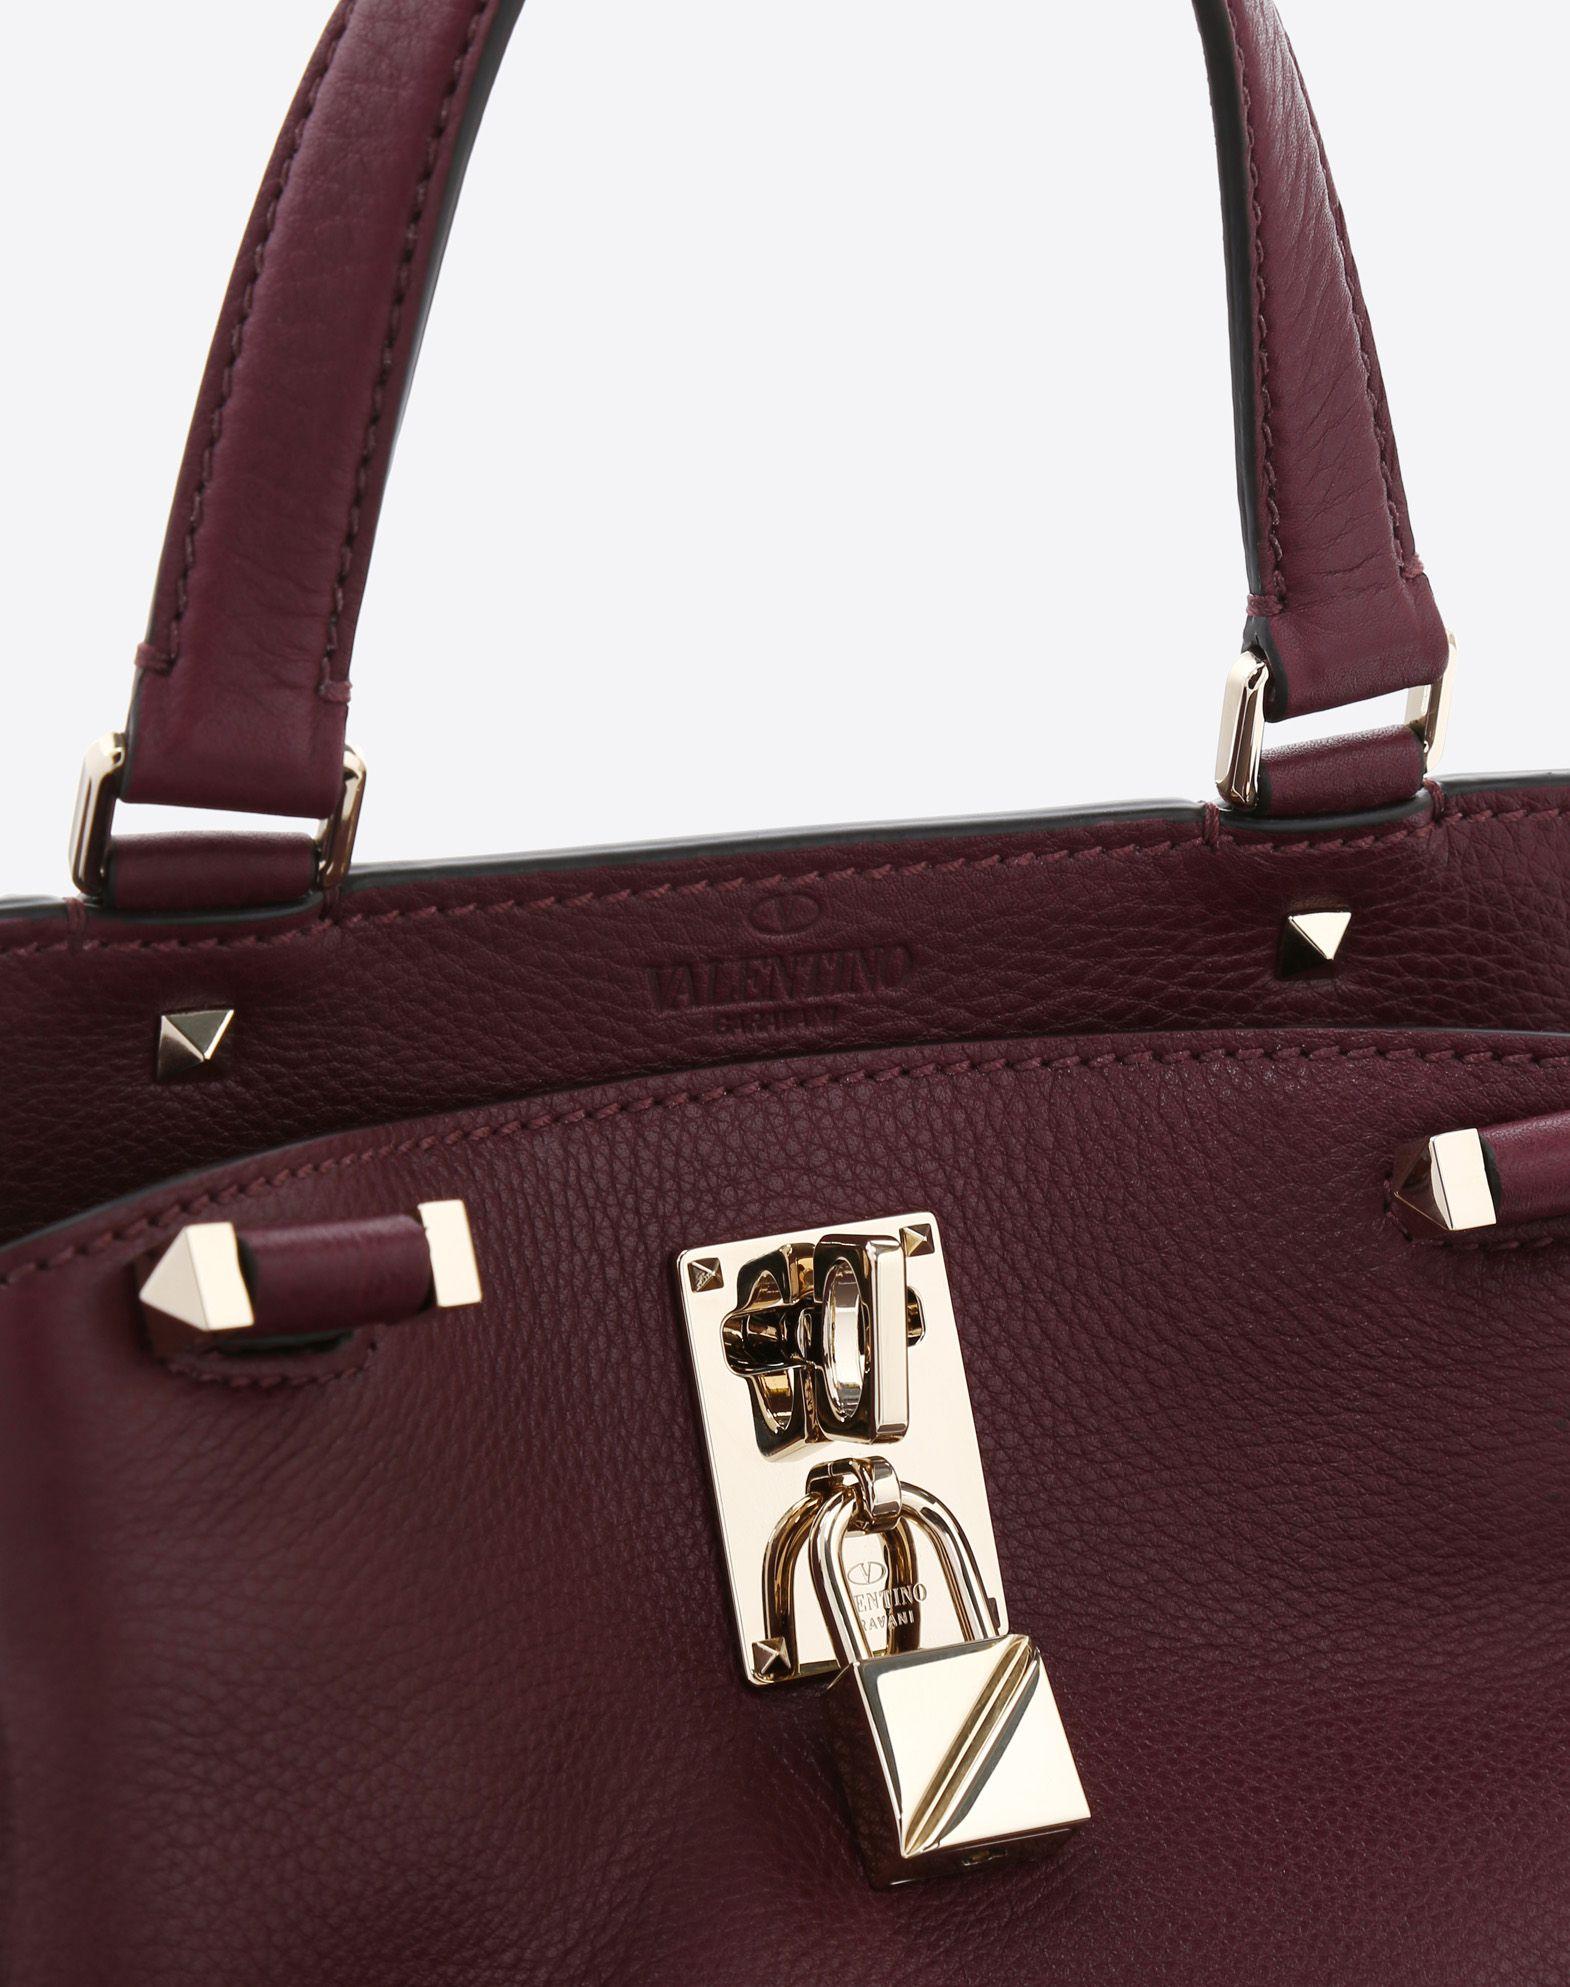 VALENTINO GARAVANI Joylock Medium Handle Bag HANDBAG D b